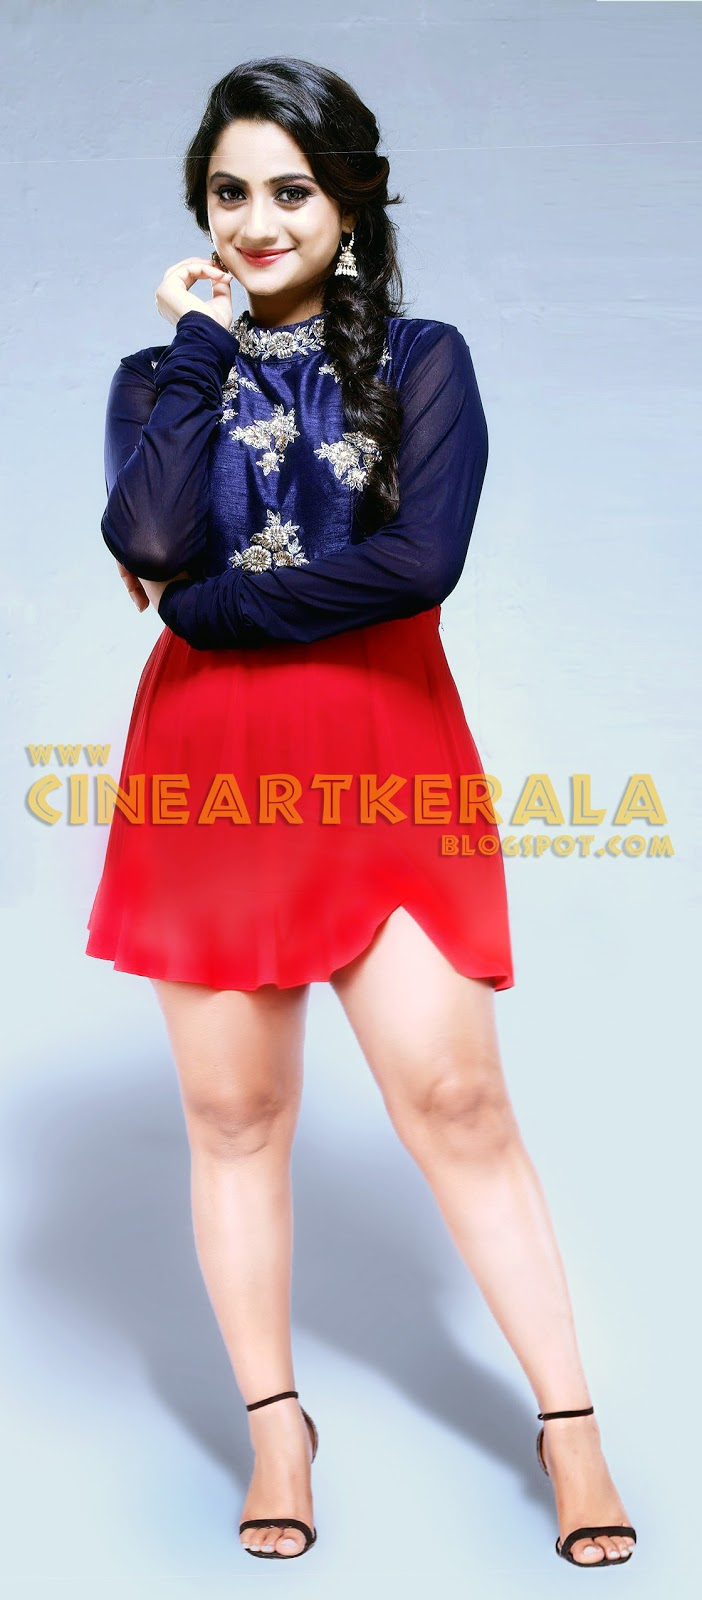 Welcome to cineartkerala.blogspot.com